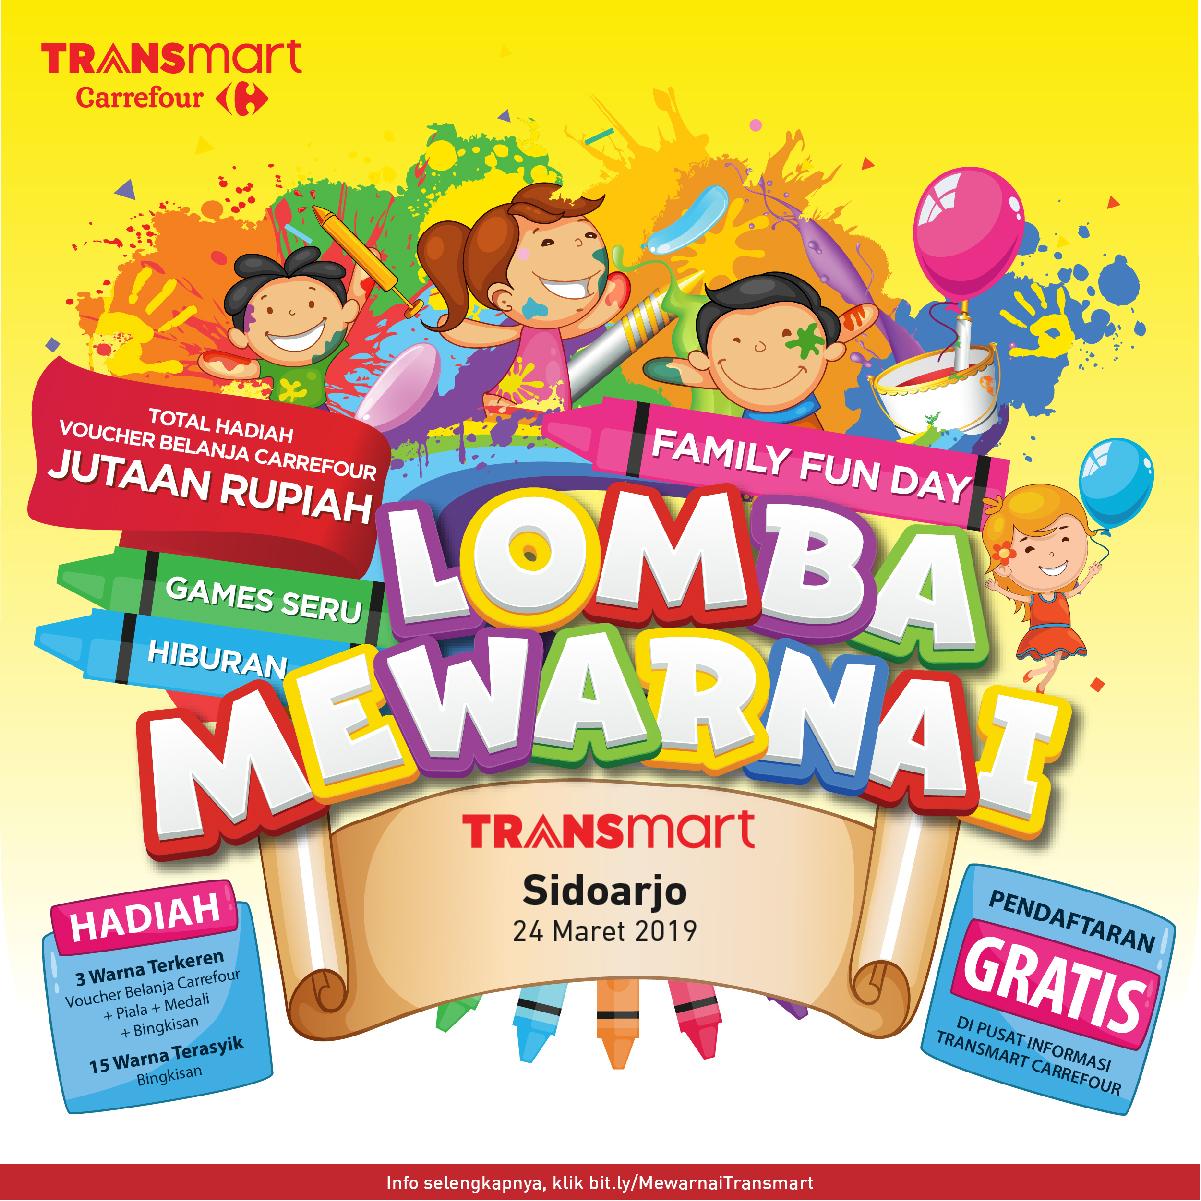 Pendaftaran Lomba Mewarnai Transmart Sidoarjo 24 Maret 2019